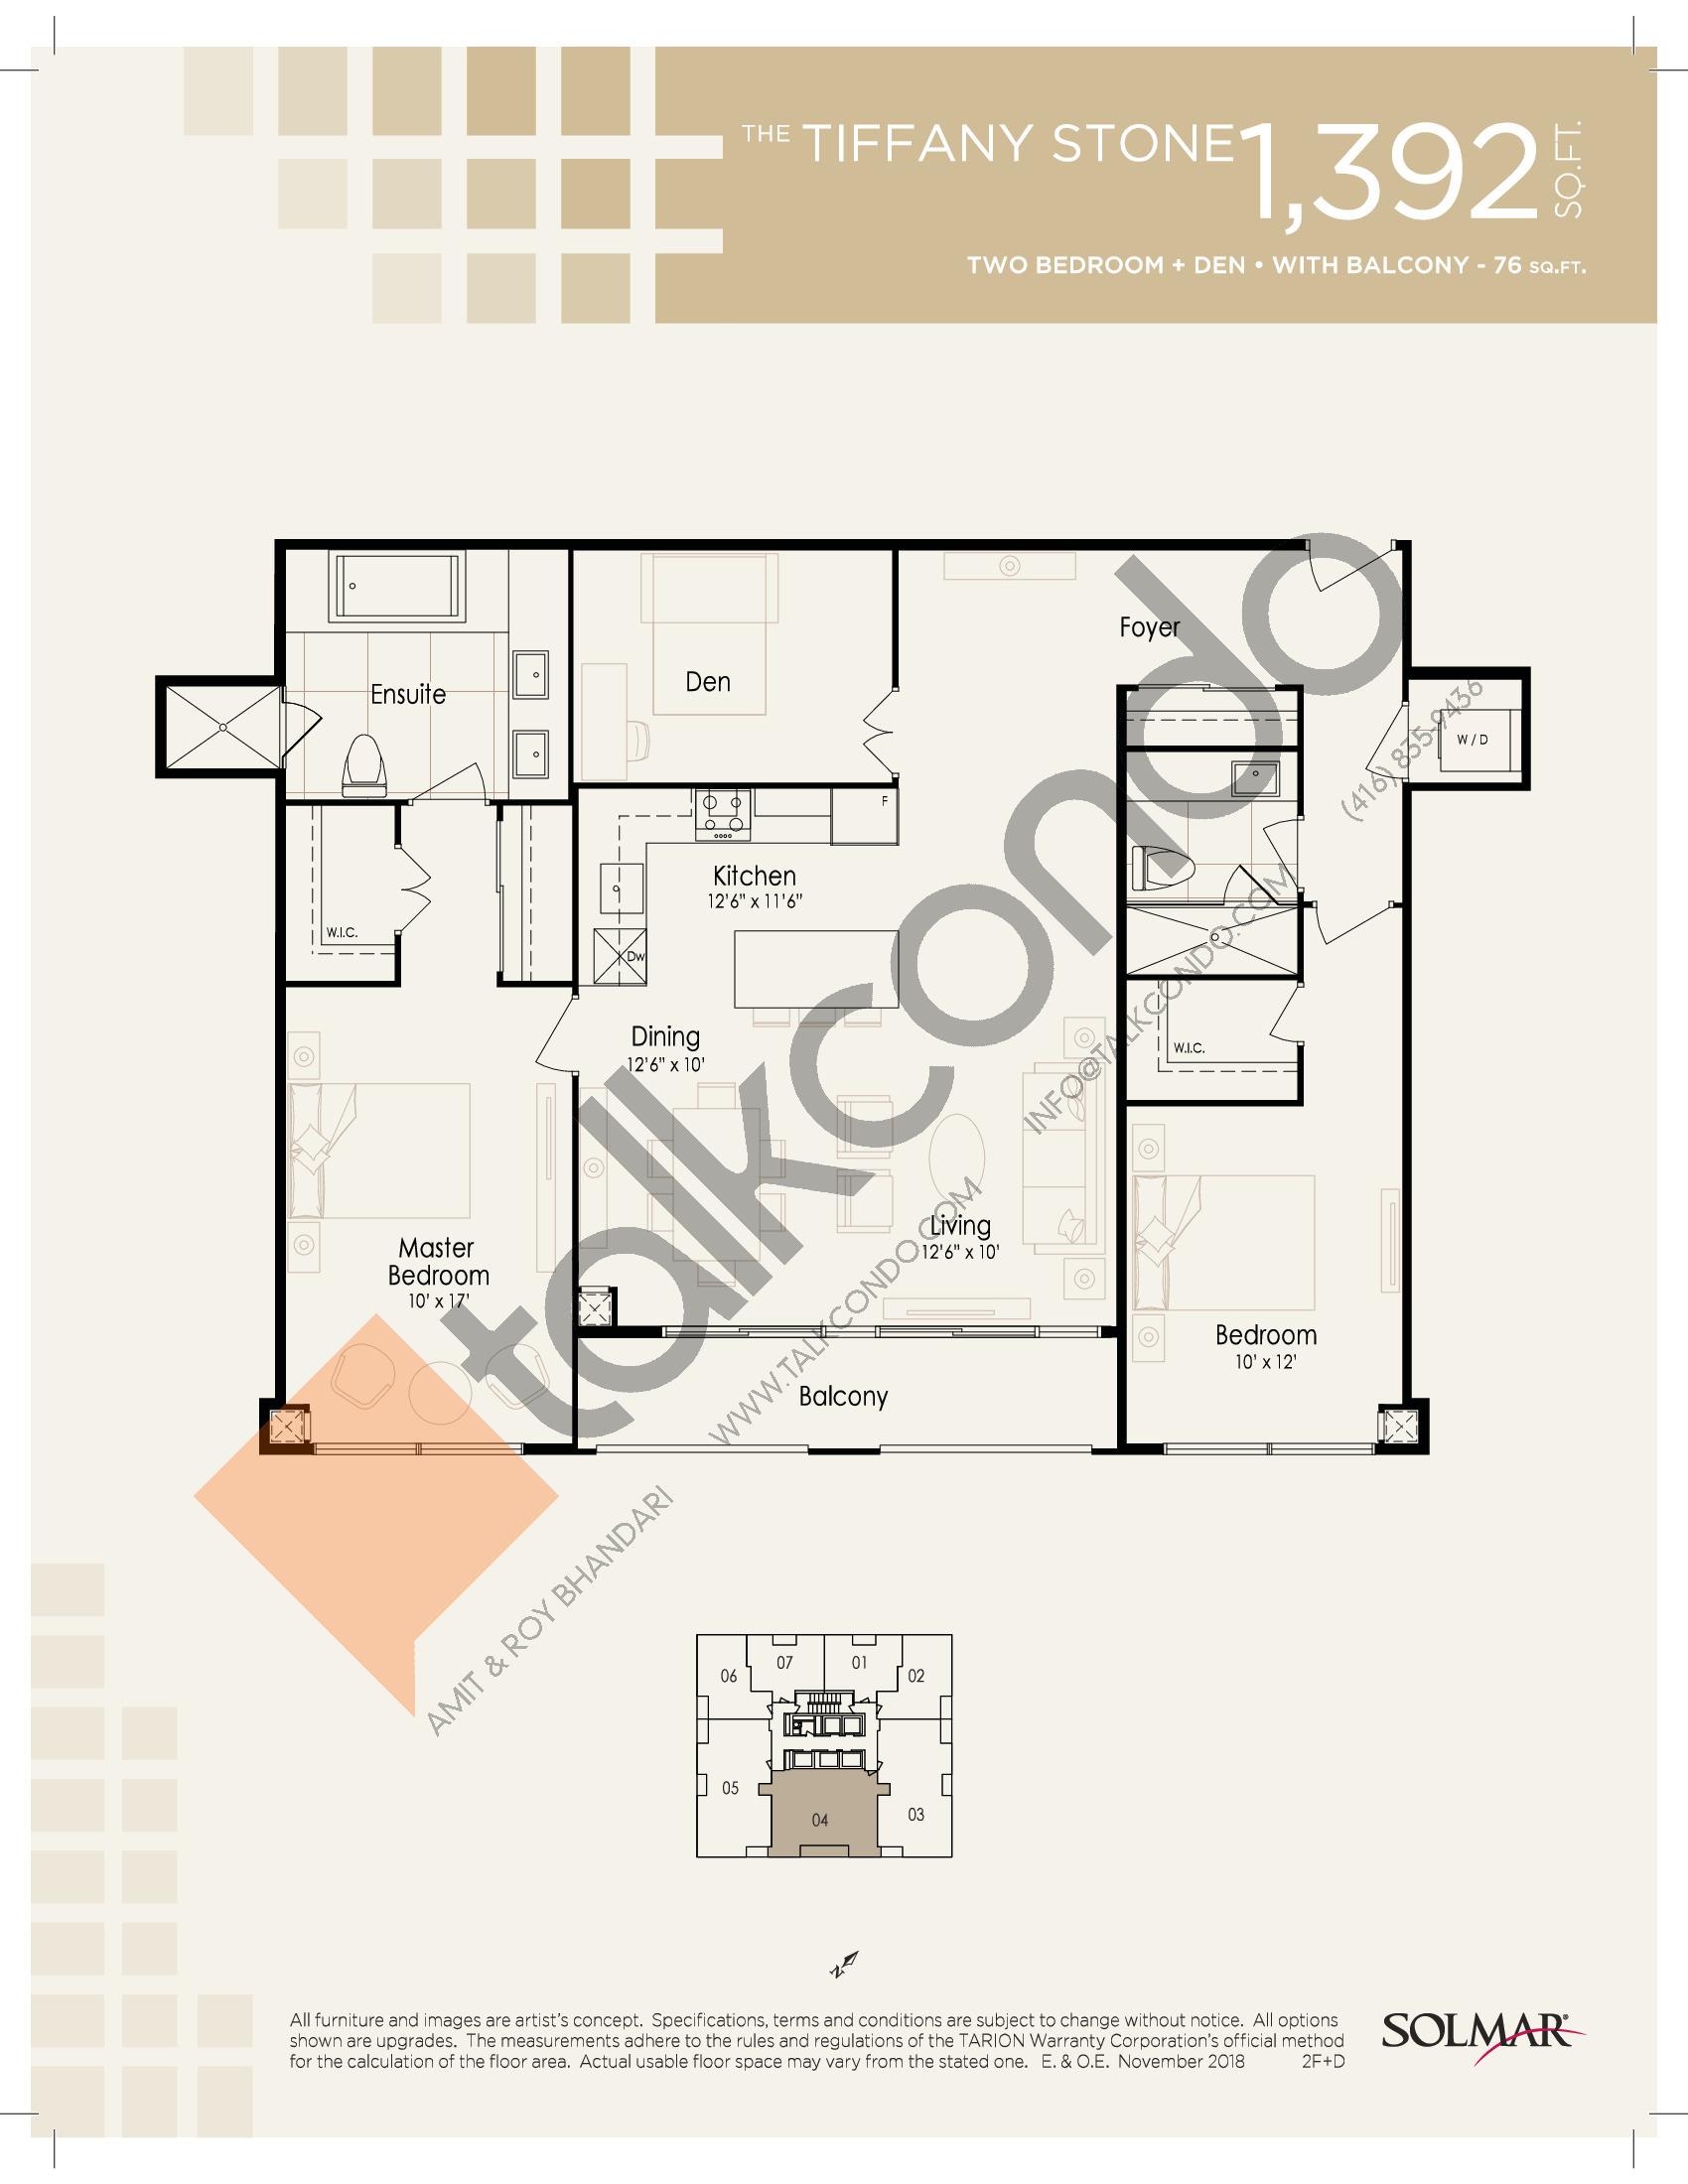 The Tiffany Stone Floor Plan at Edge Tower 2 Condos - 1392 sq.ft